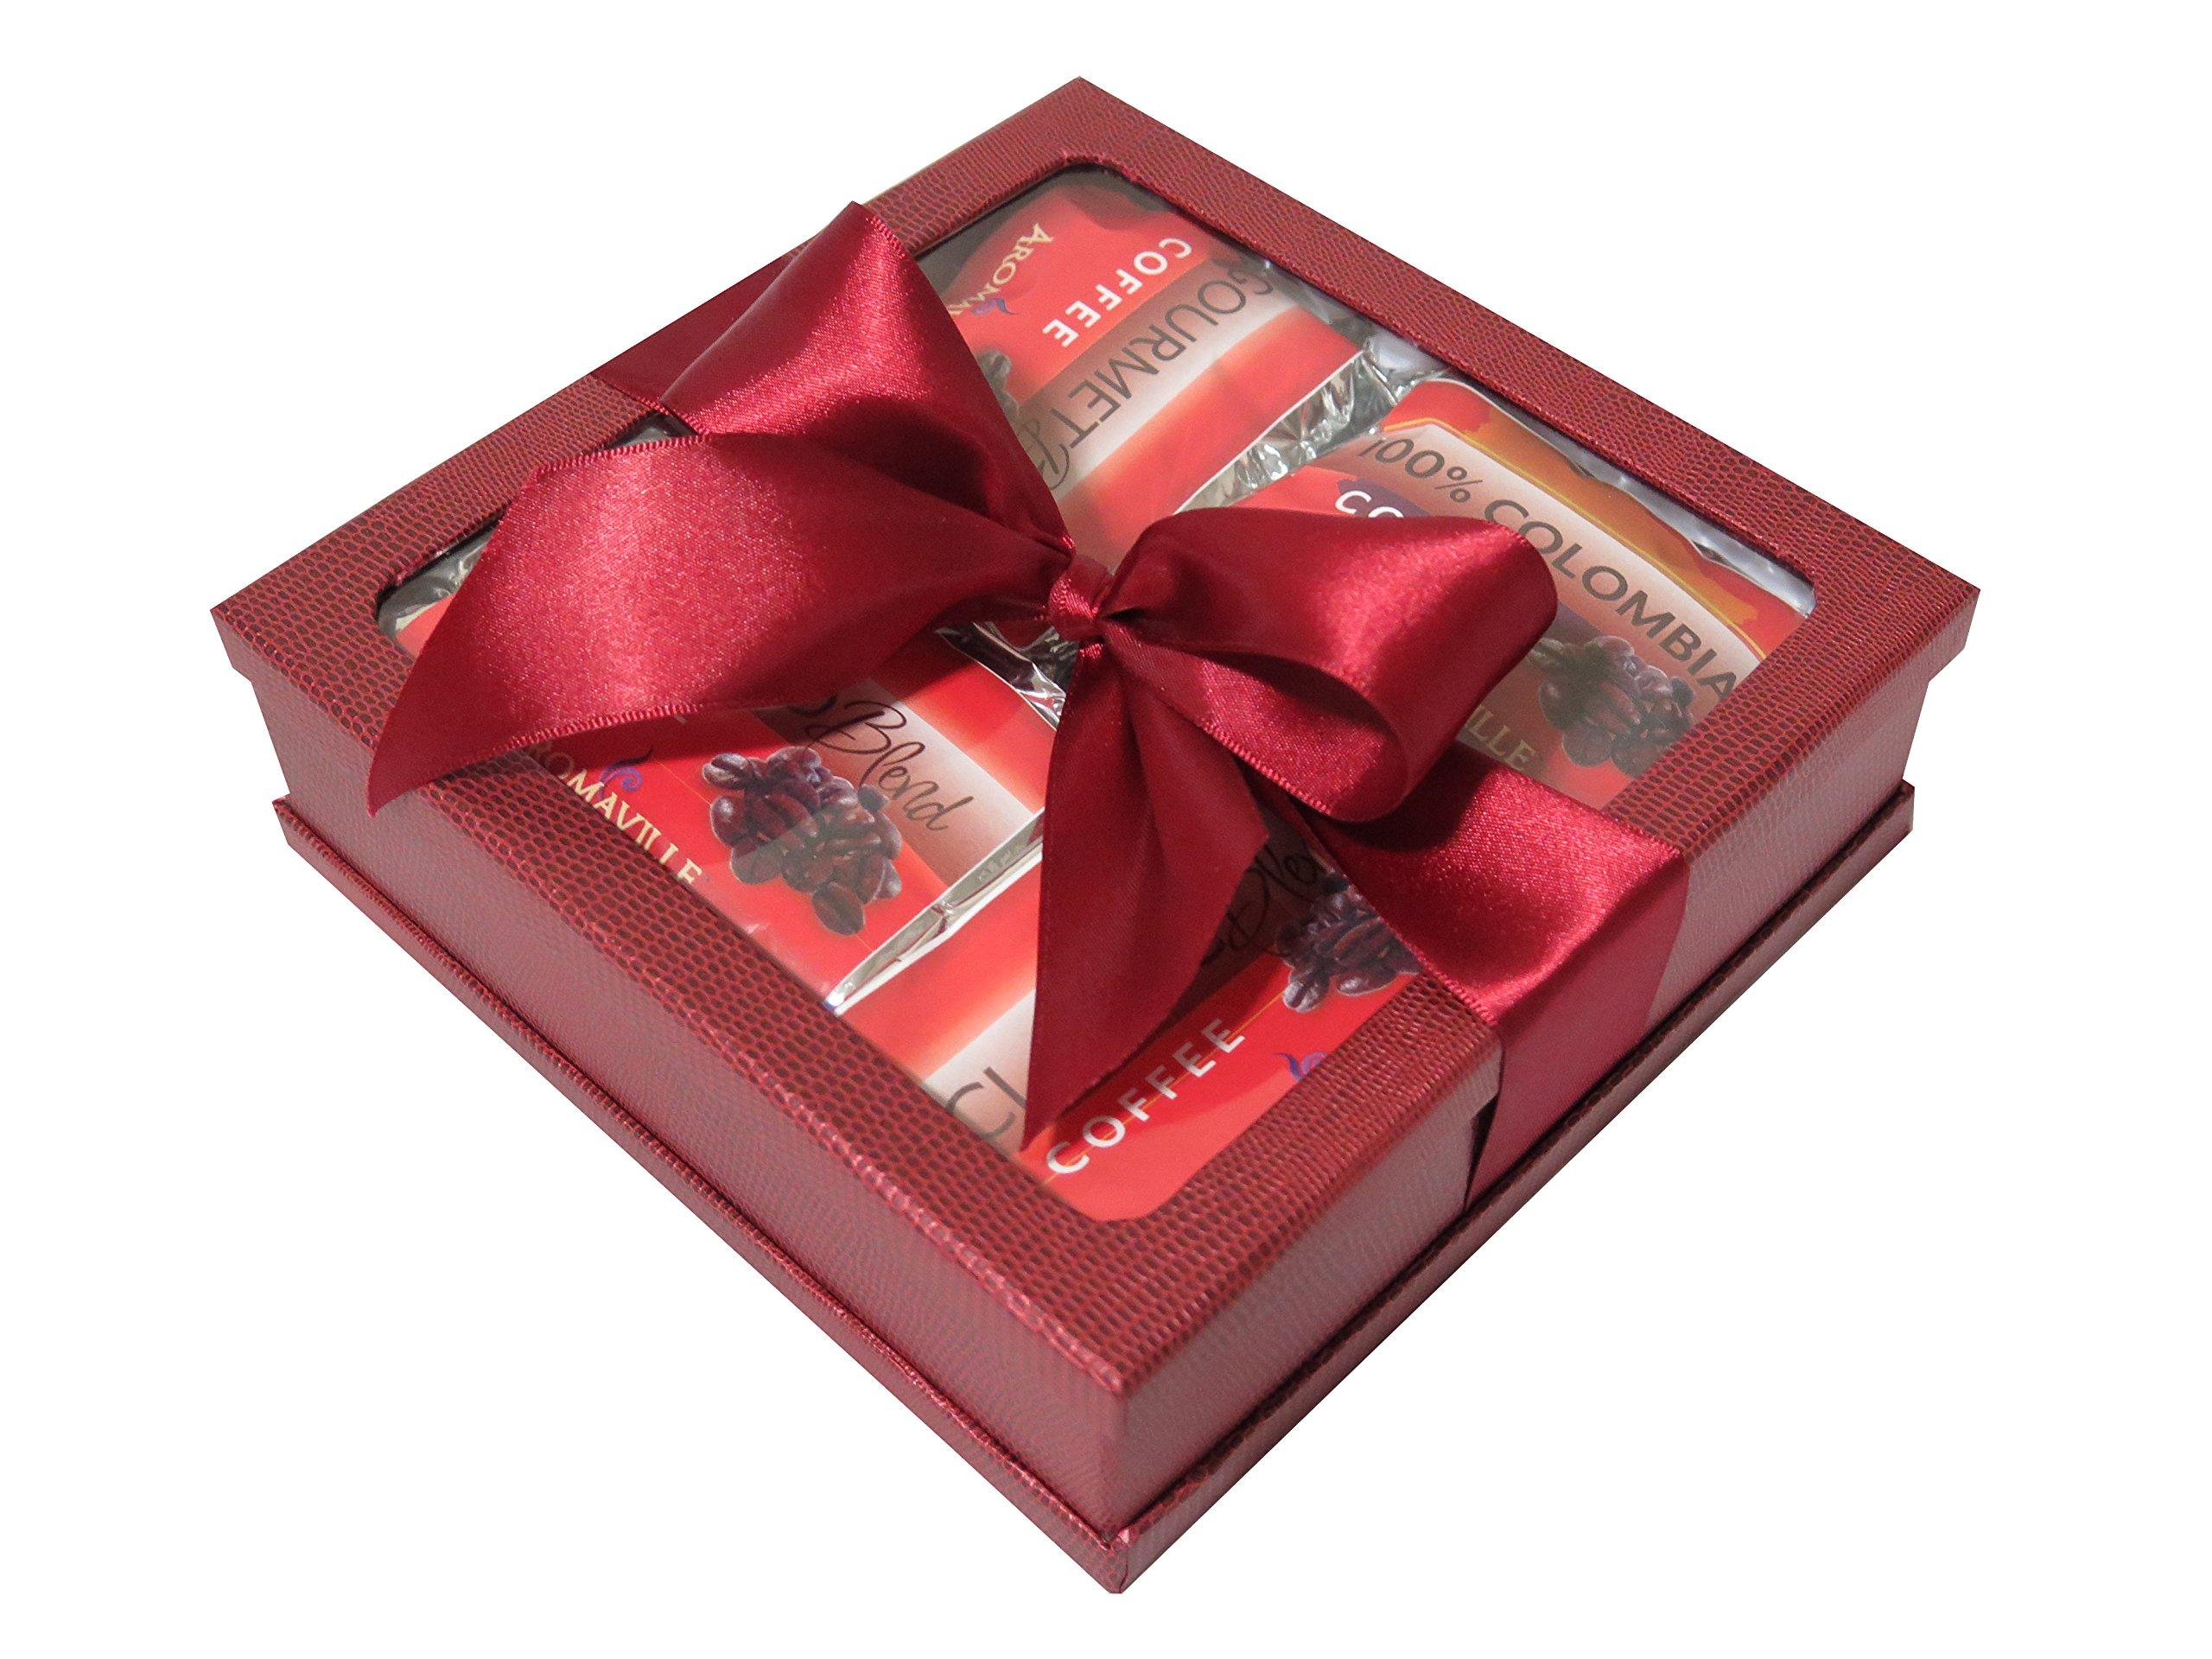 Gourmet Coffee Gift Set - Coffee Gift Basket - Coffee Lovers Gifts - Coffee Gift Set - Best Coffee Gift (Burgundy)